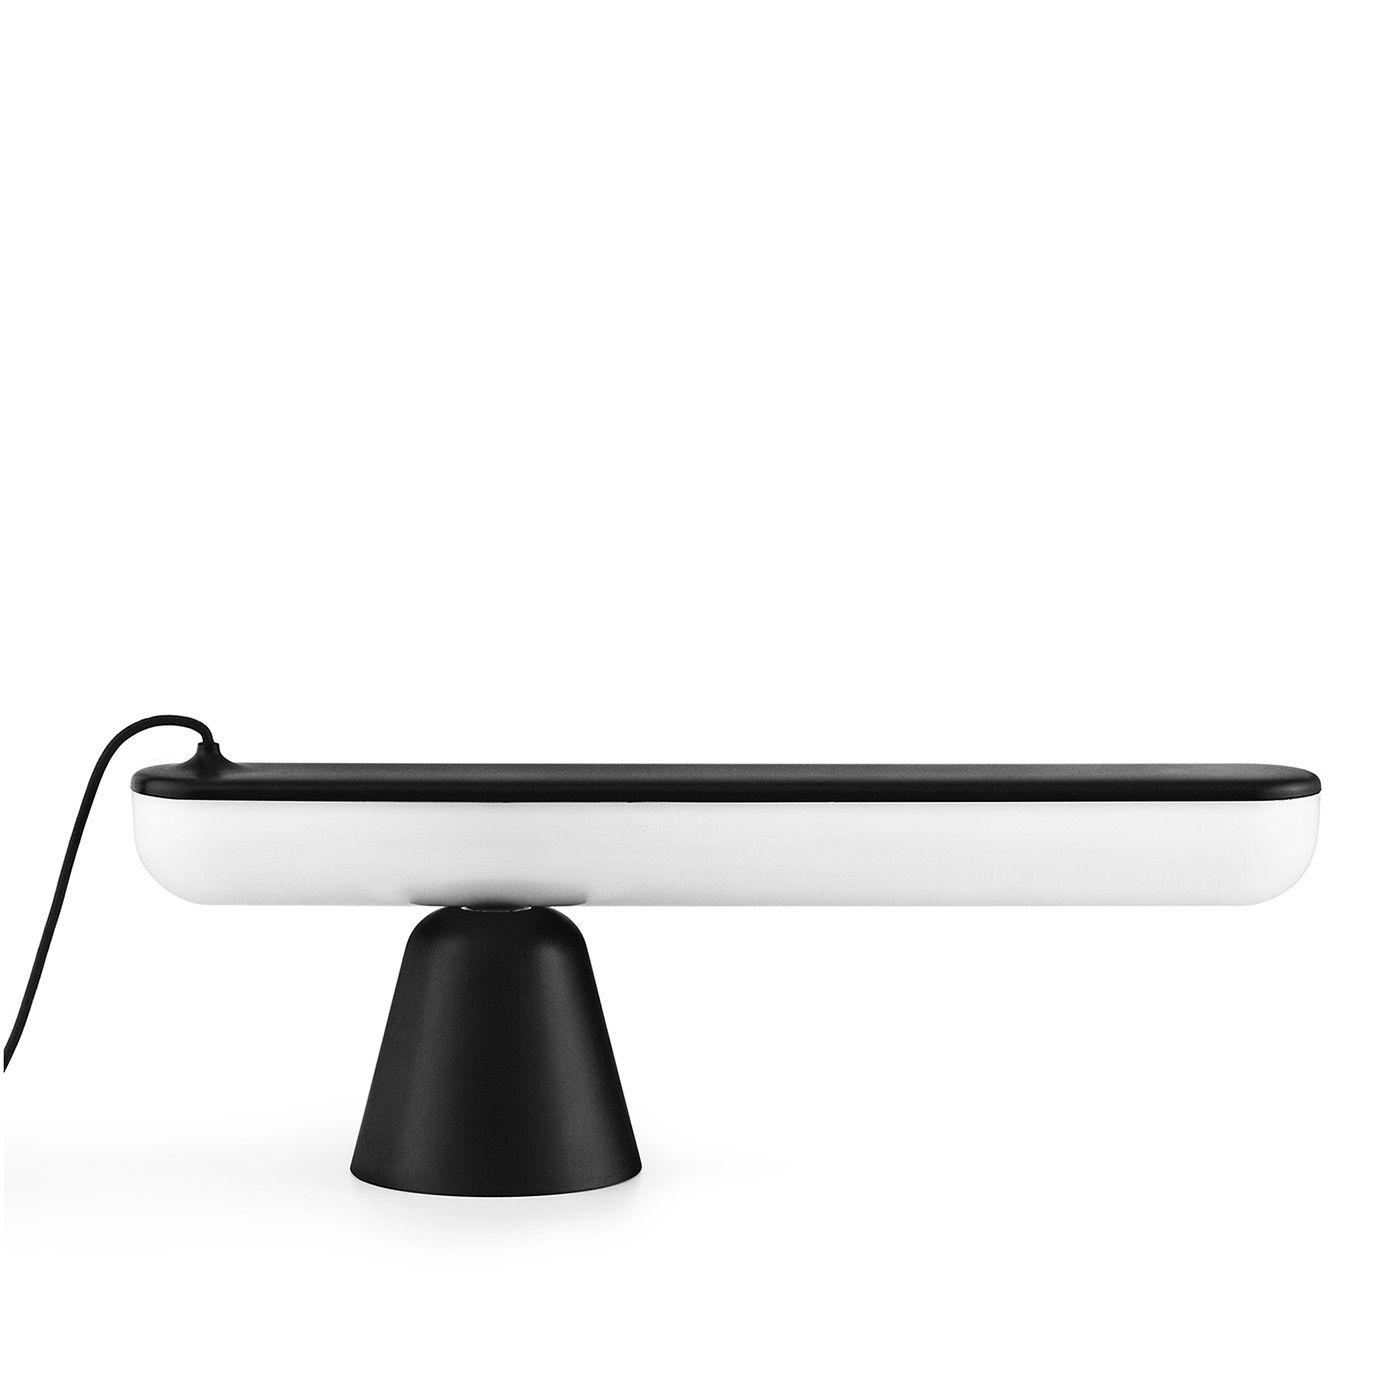 Acrobat tafellamp Normann Copenhagen zwart